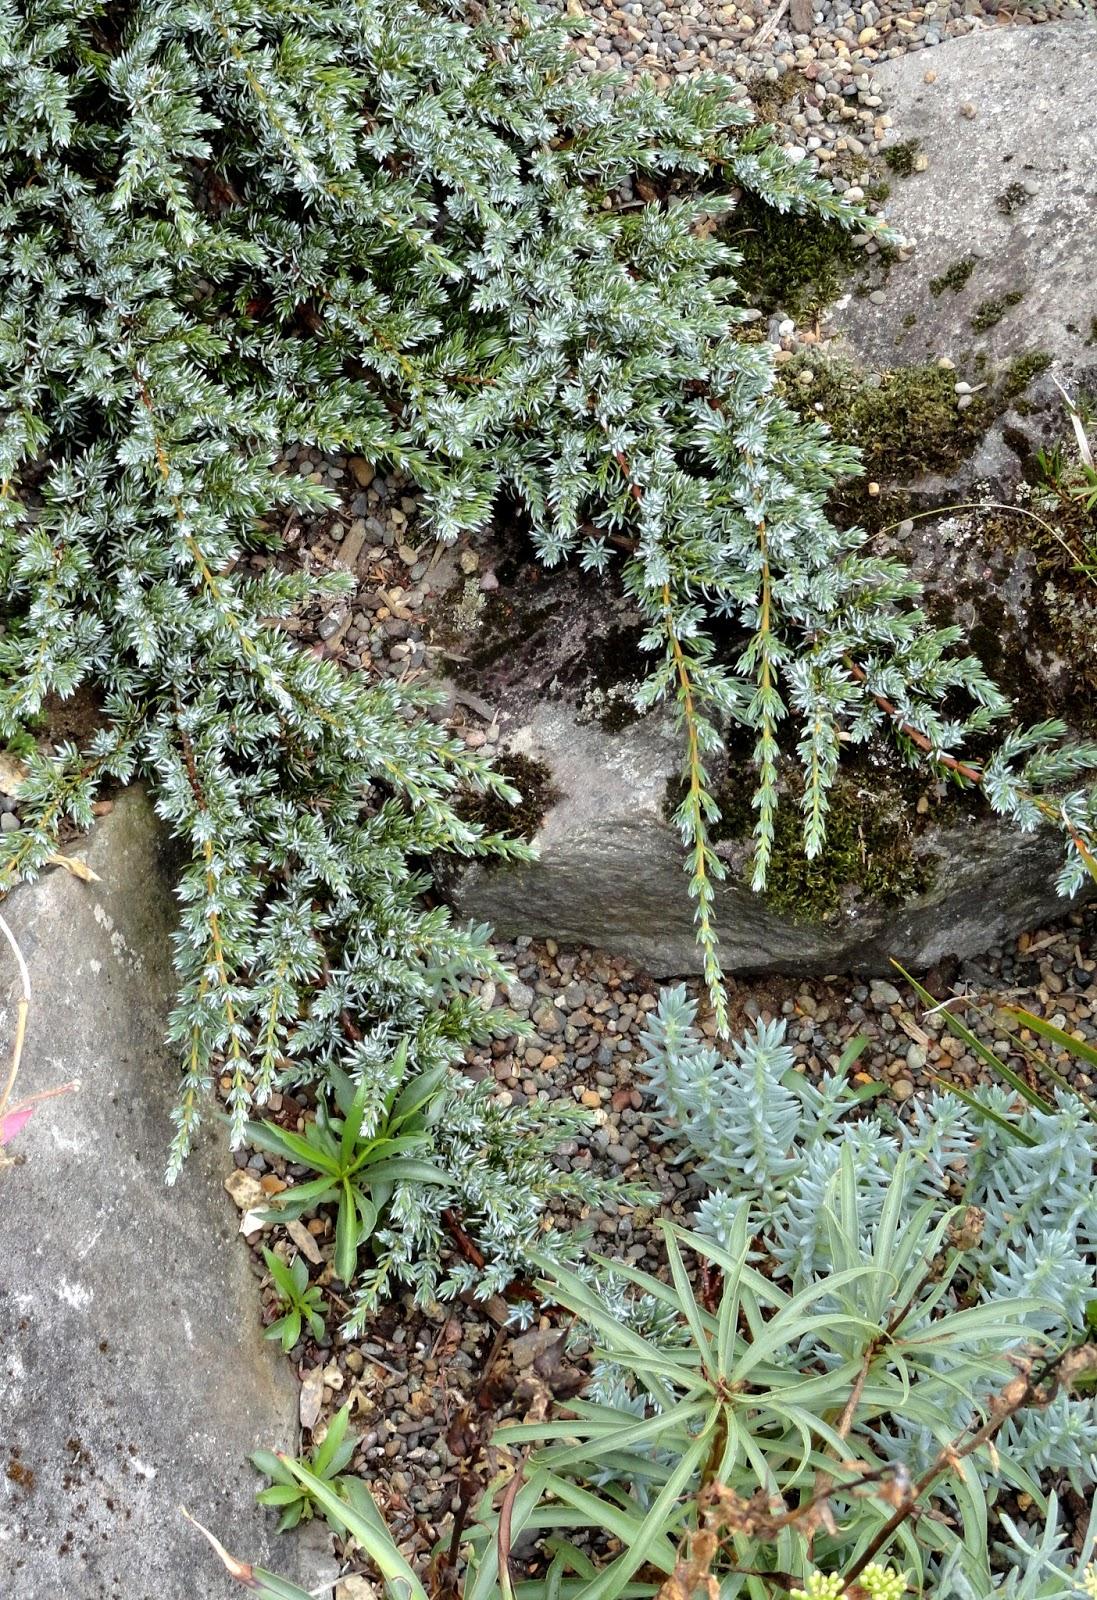 Danger Garden Garden Visit Greg Shepherd Of Xera Plants At Home